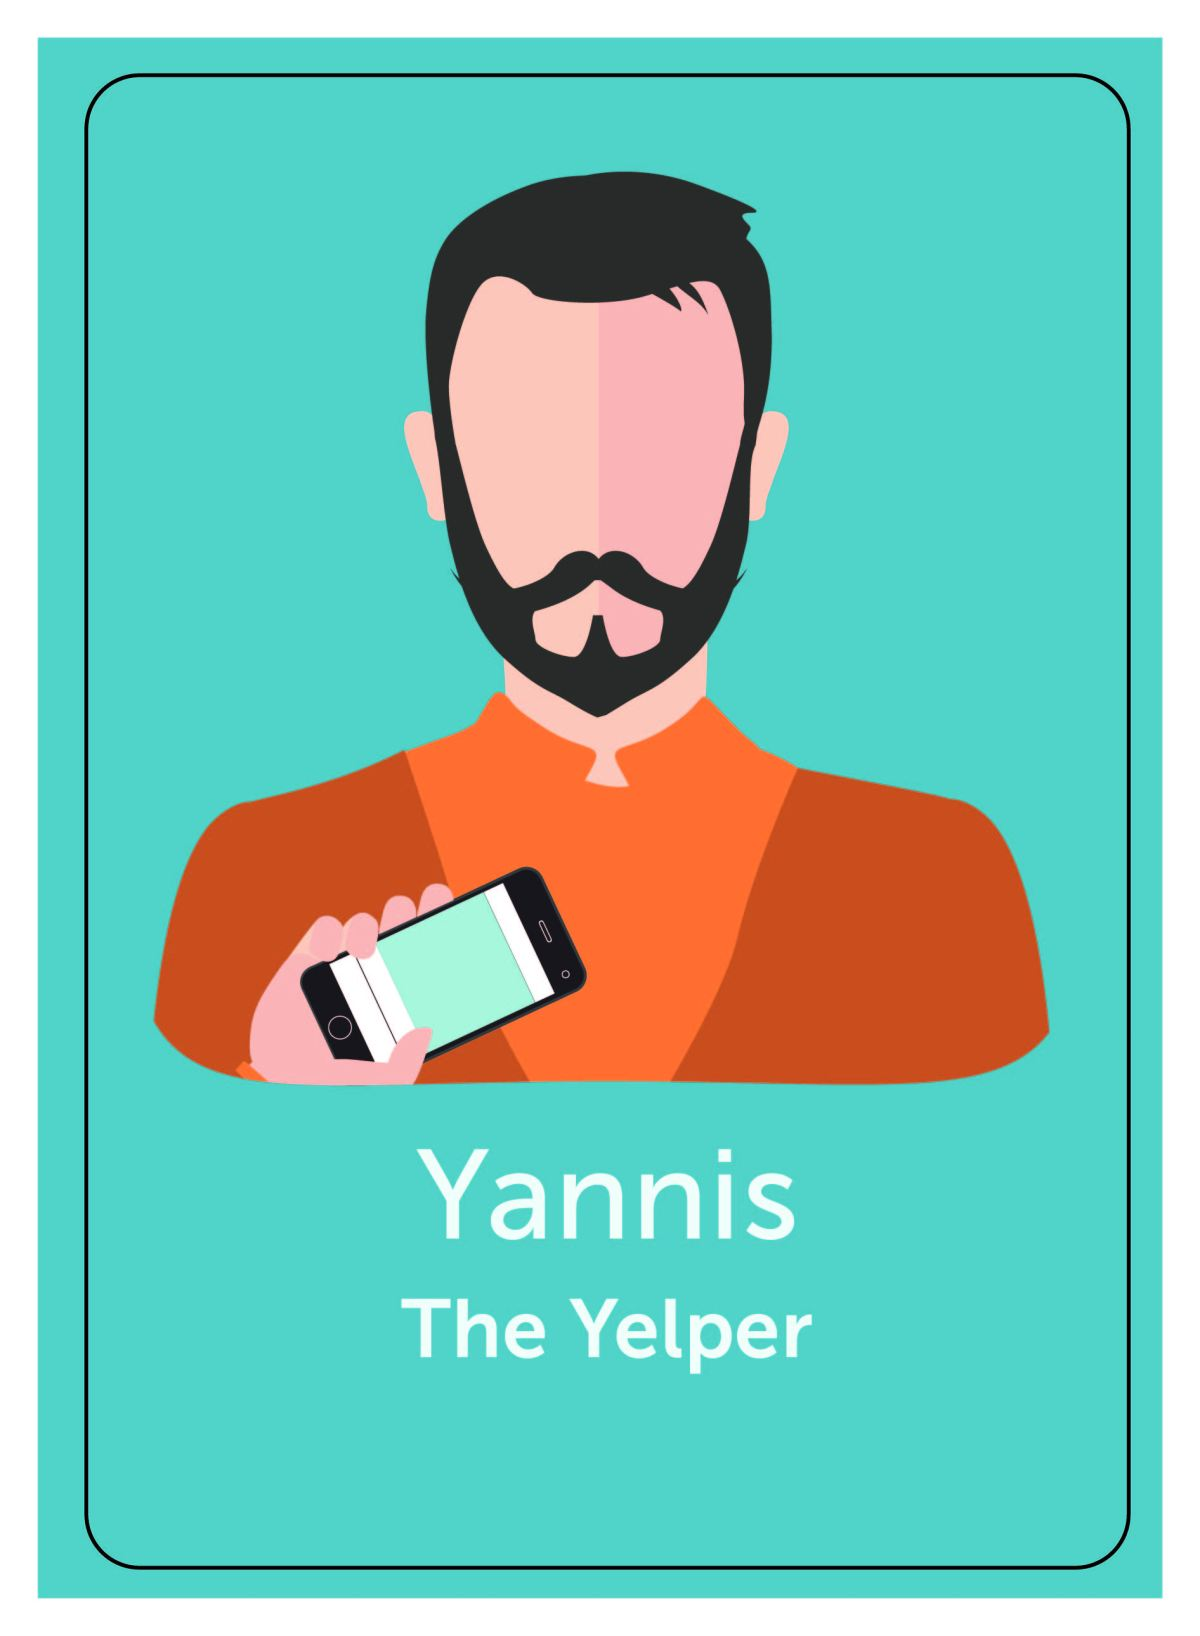 Everyone's a Yannis